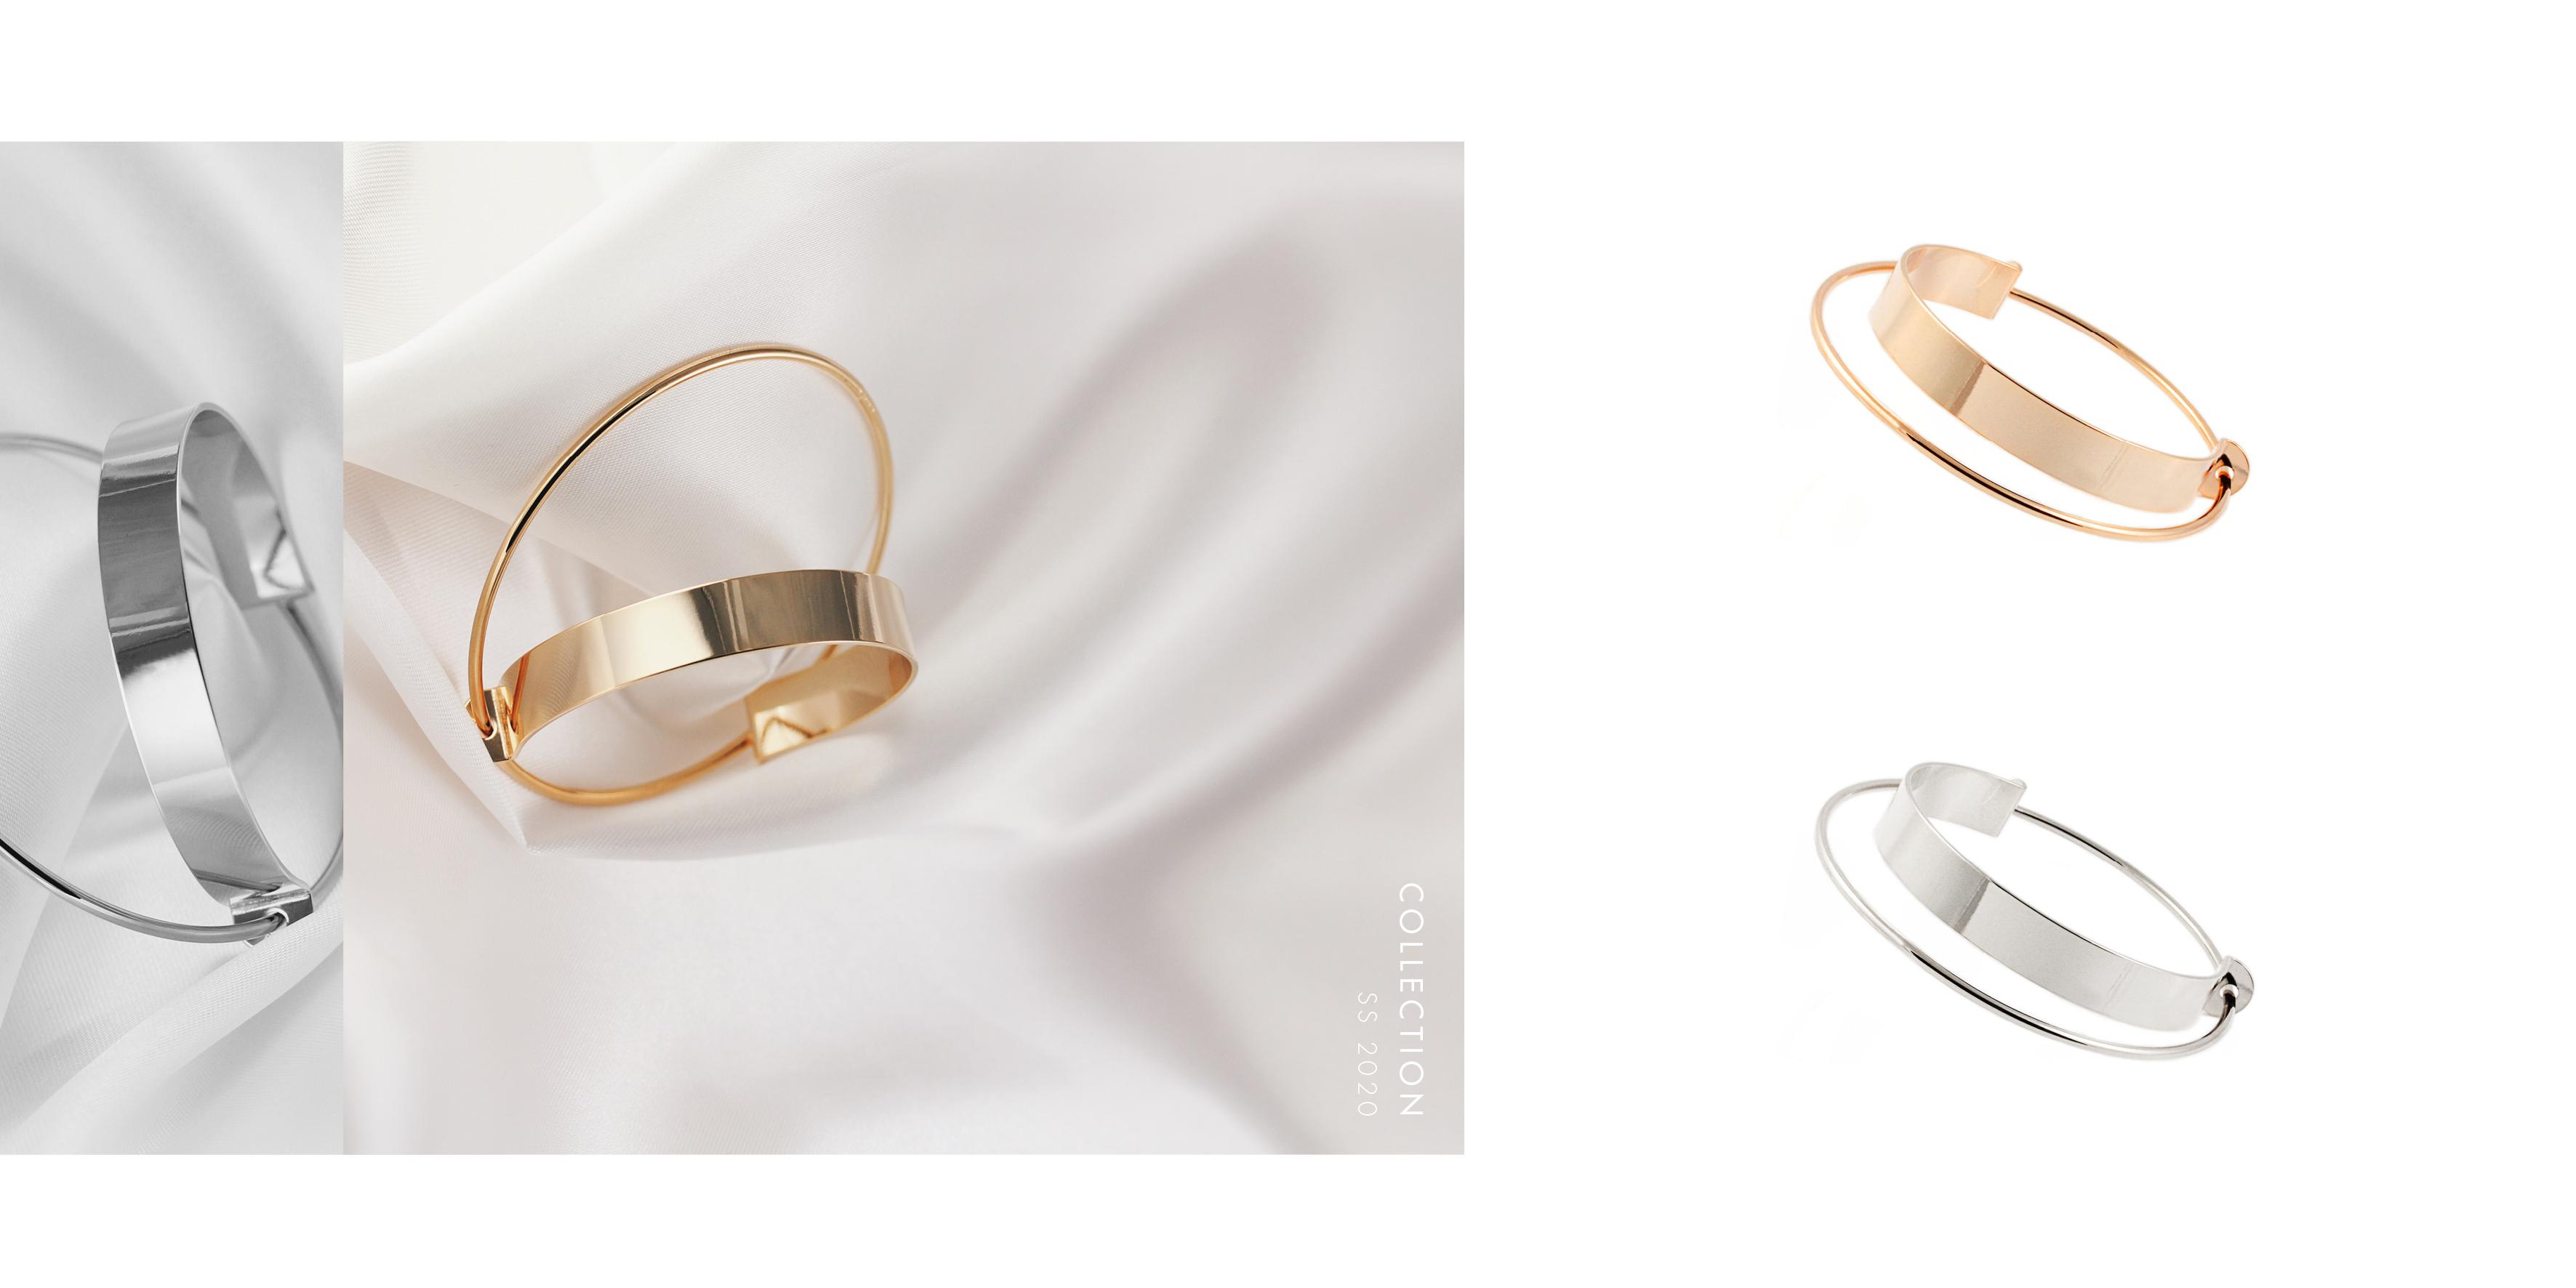 moderne Armspangen Gold vergoldet Madeleine Issing